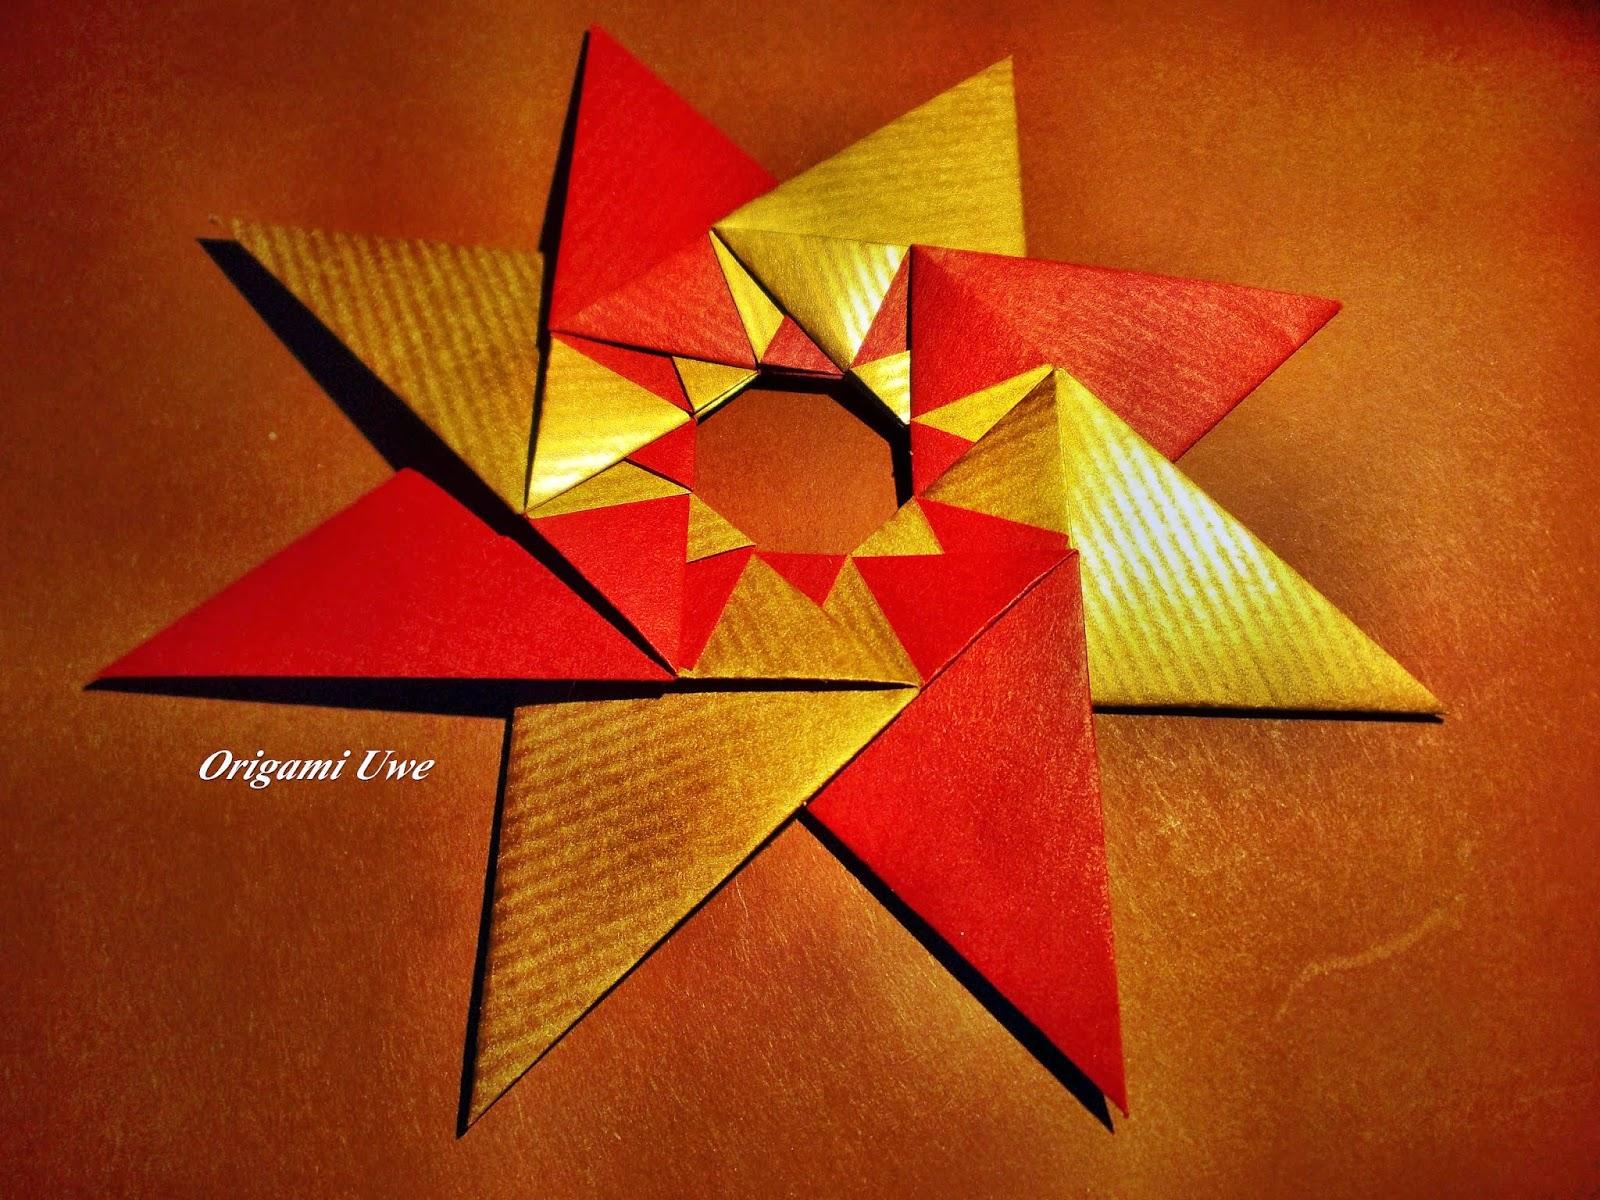 Origami, Fleurogami und Sterne: Modular Origami Star - photo#36